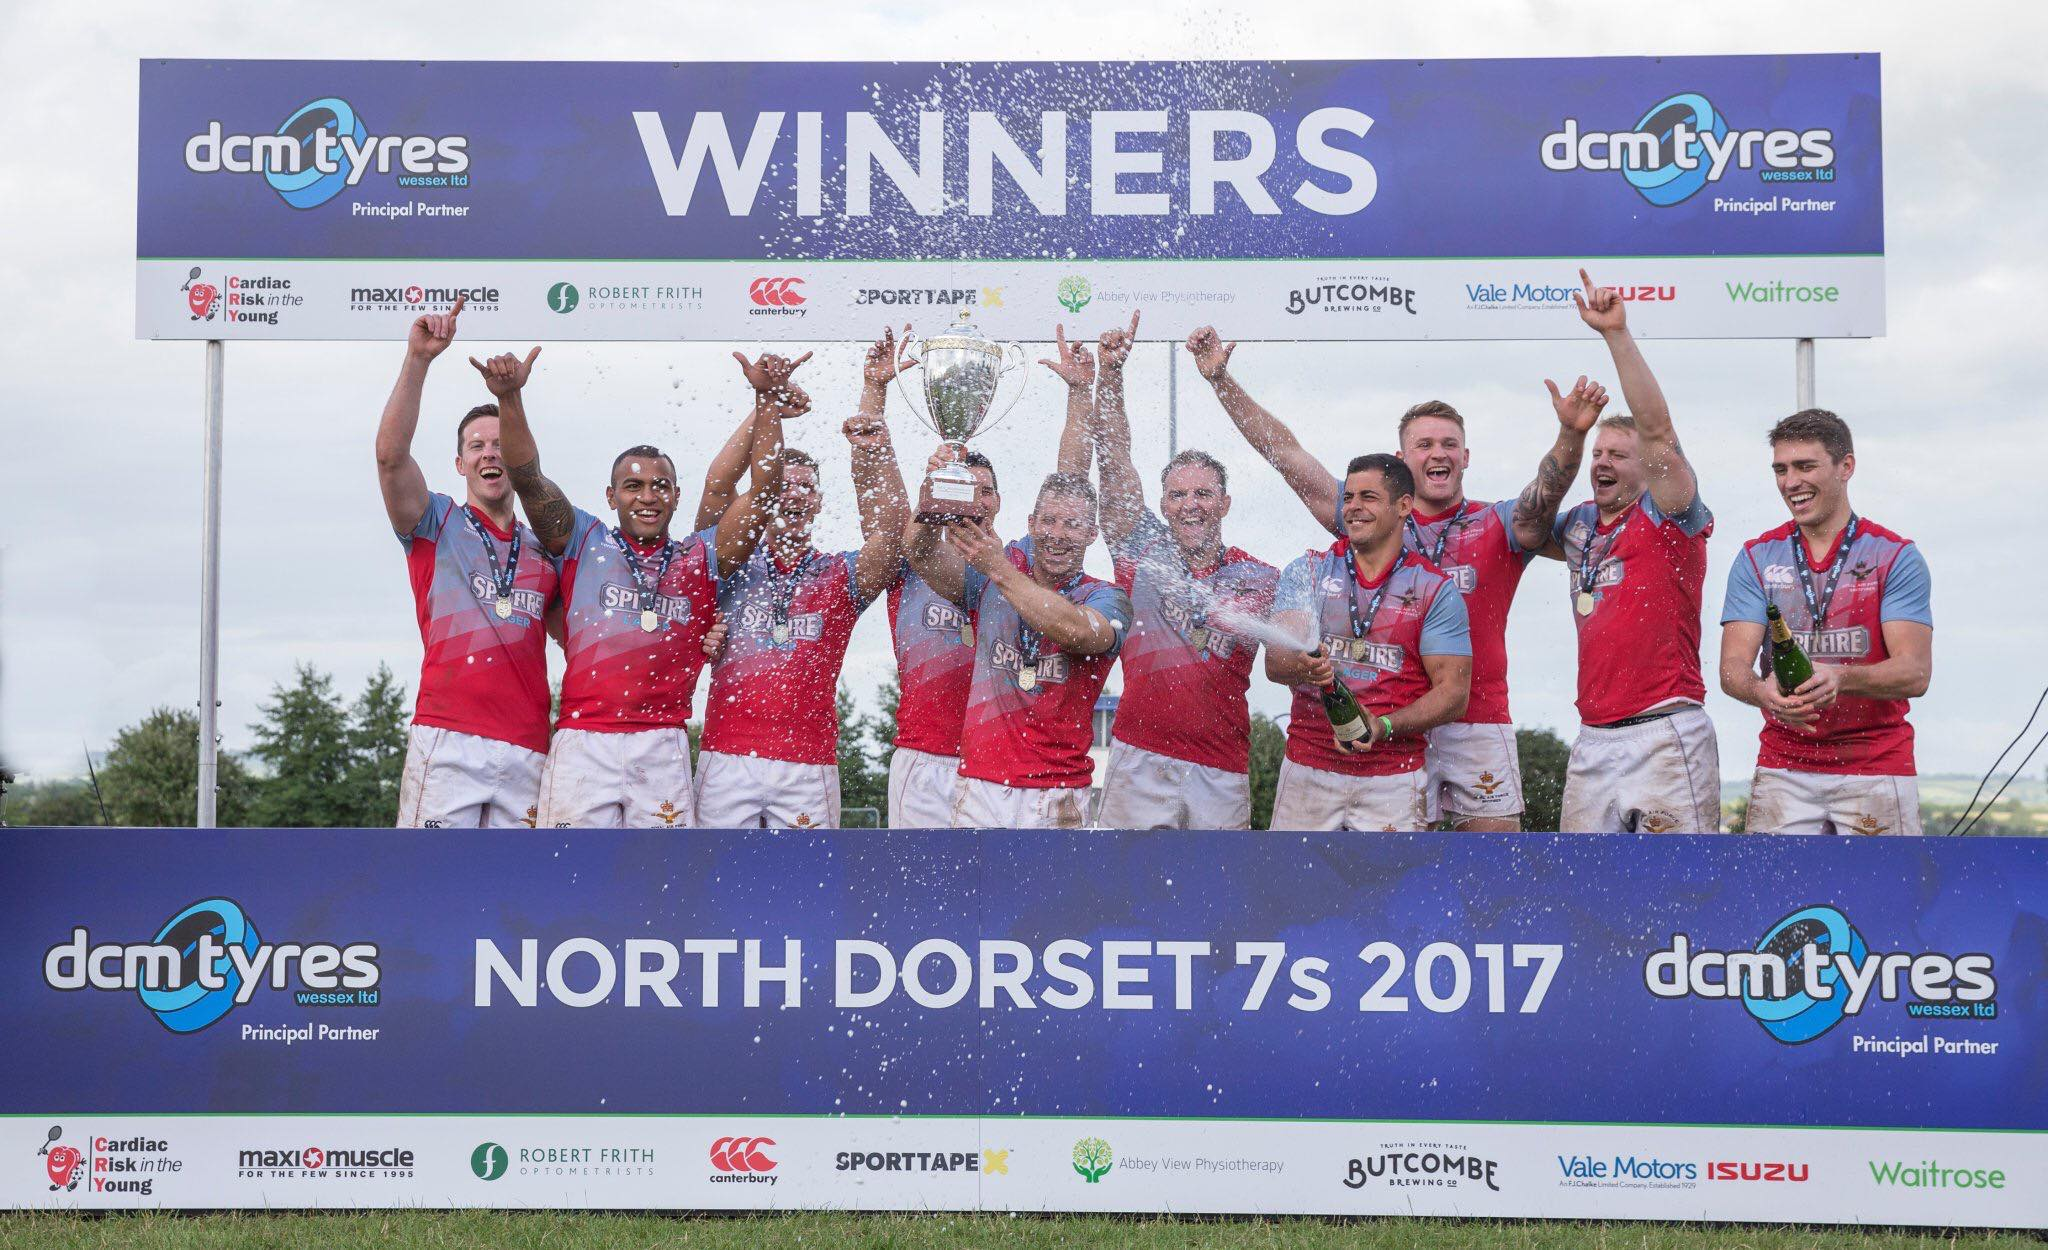 Winners podium for North Dorset 7s 2017.